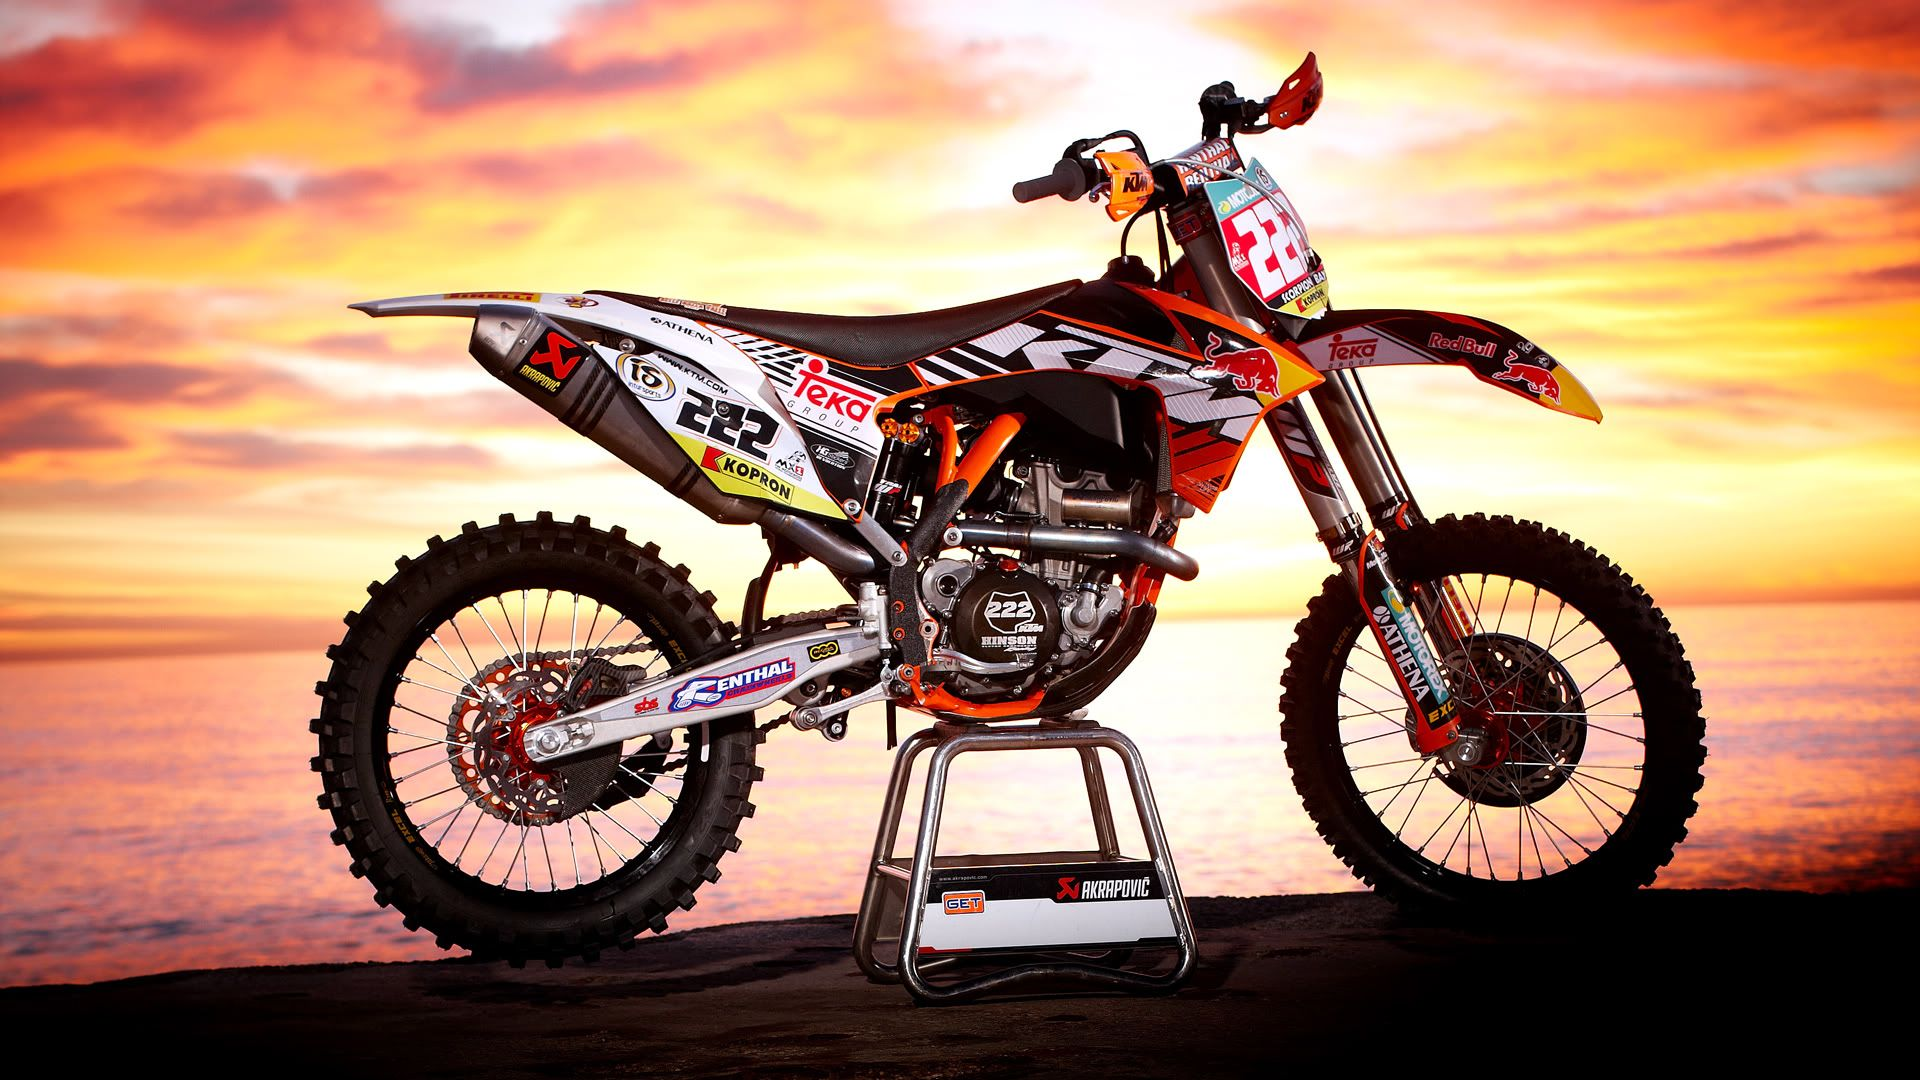 Ktm Logo Wallpaper Ktm Dirt Bikes Racing Bikes Enduro Motocross